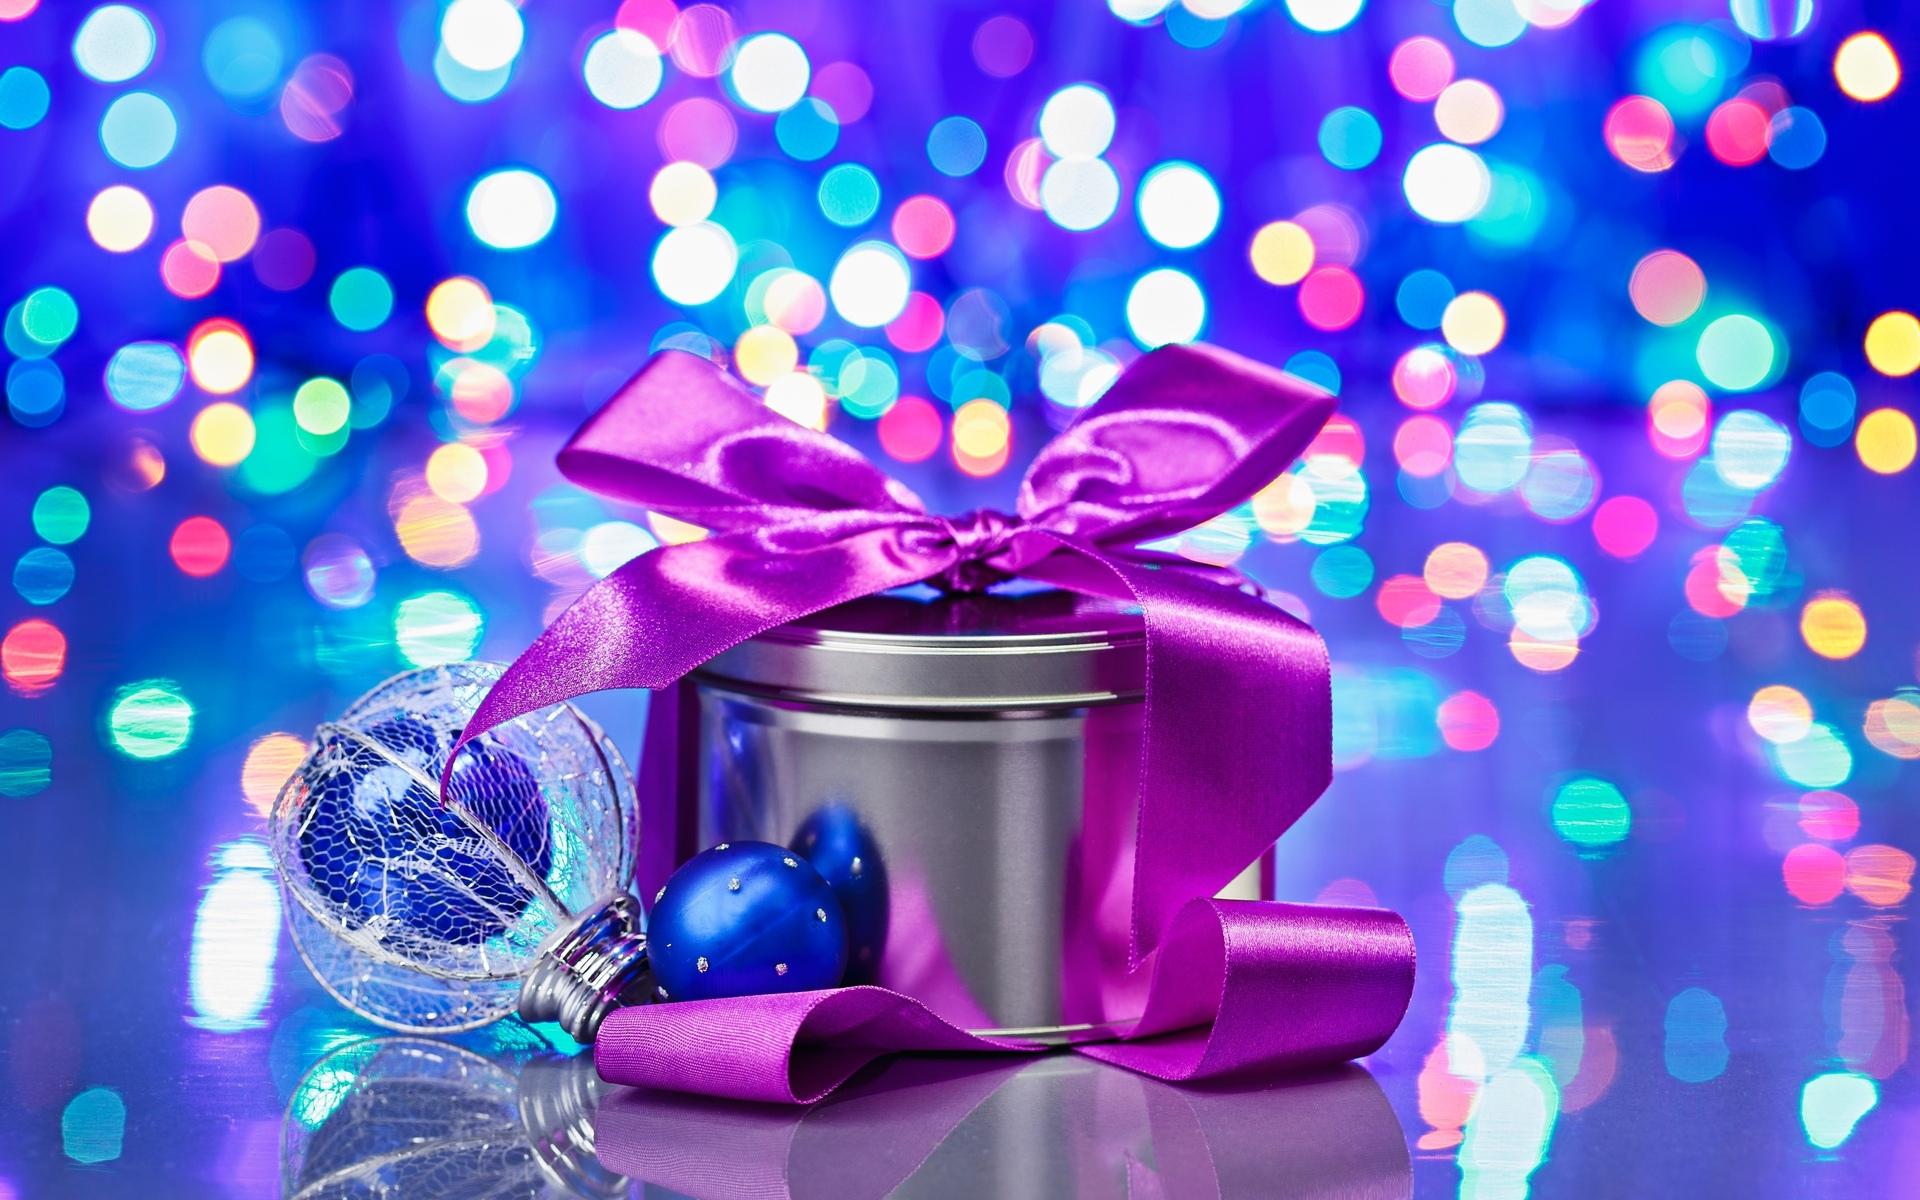 1920x1200 Px Birthday Christmas Color Holidays Lights New Year Seasonal Sparkle